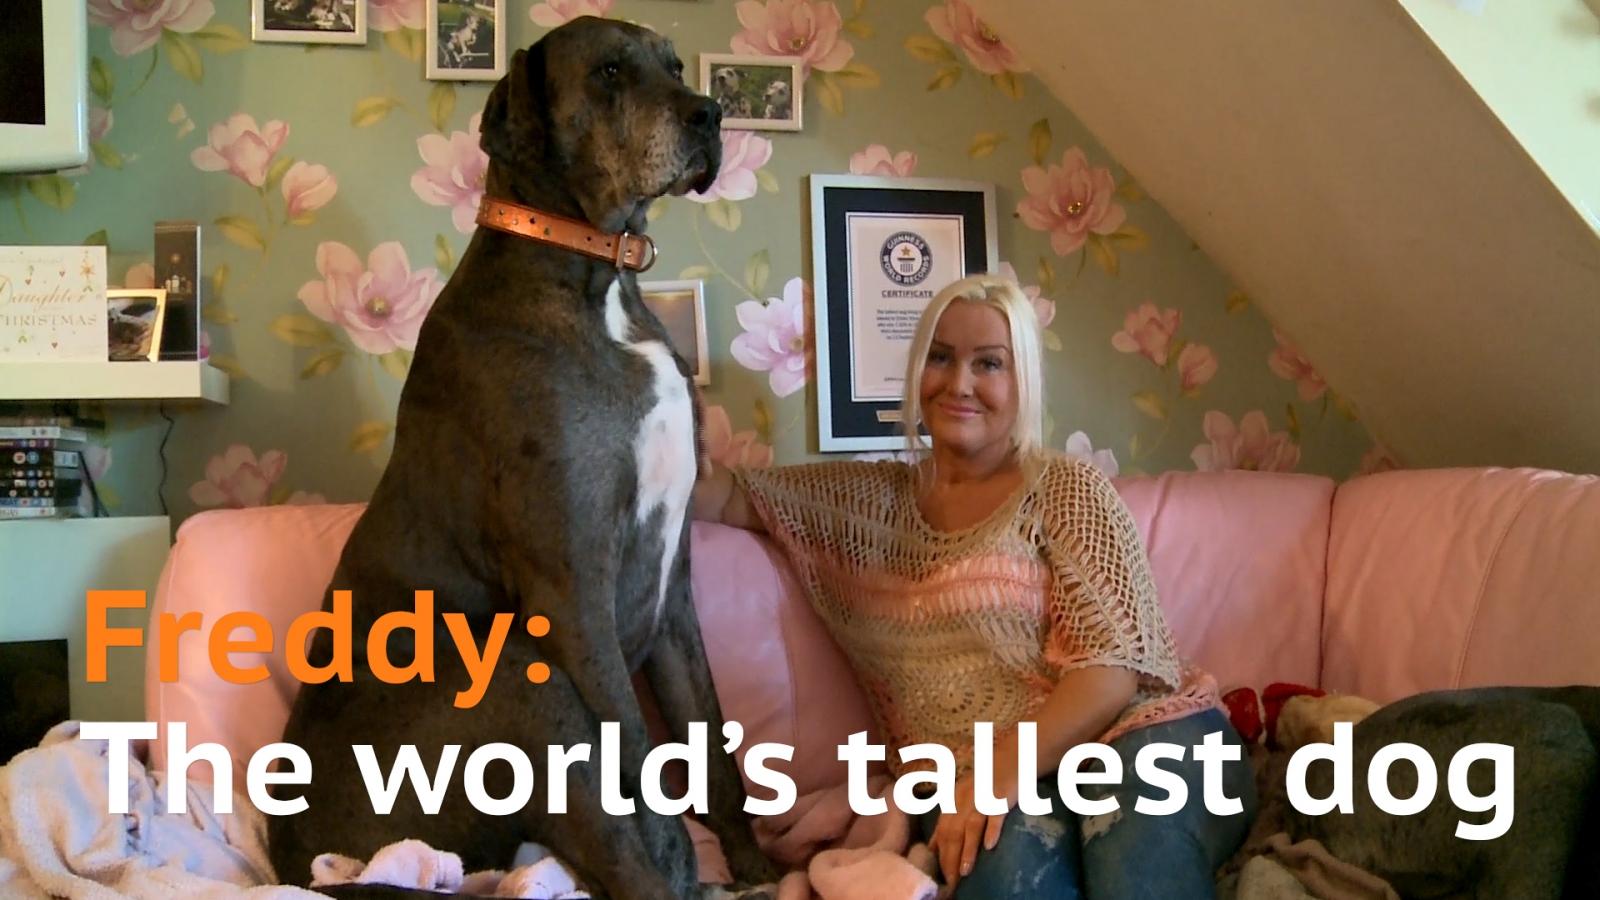 World's tallest dog Freddy